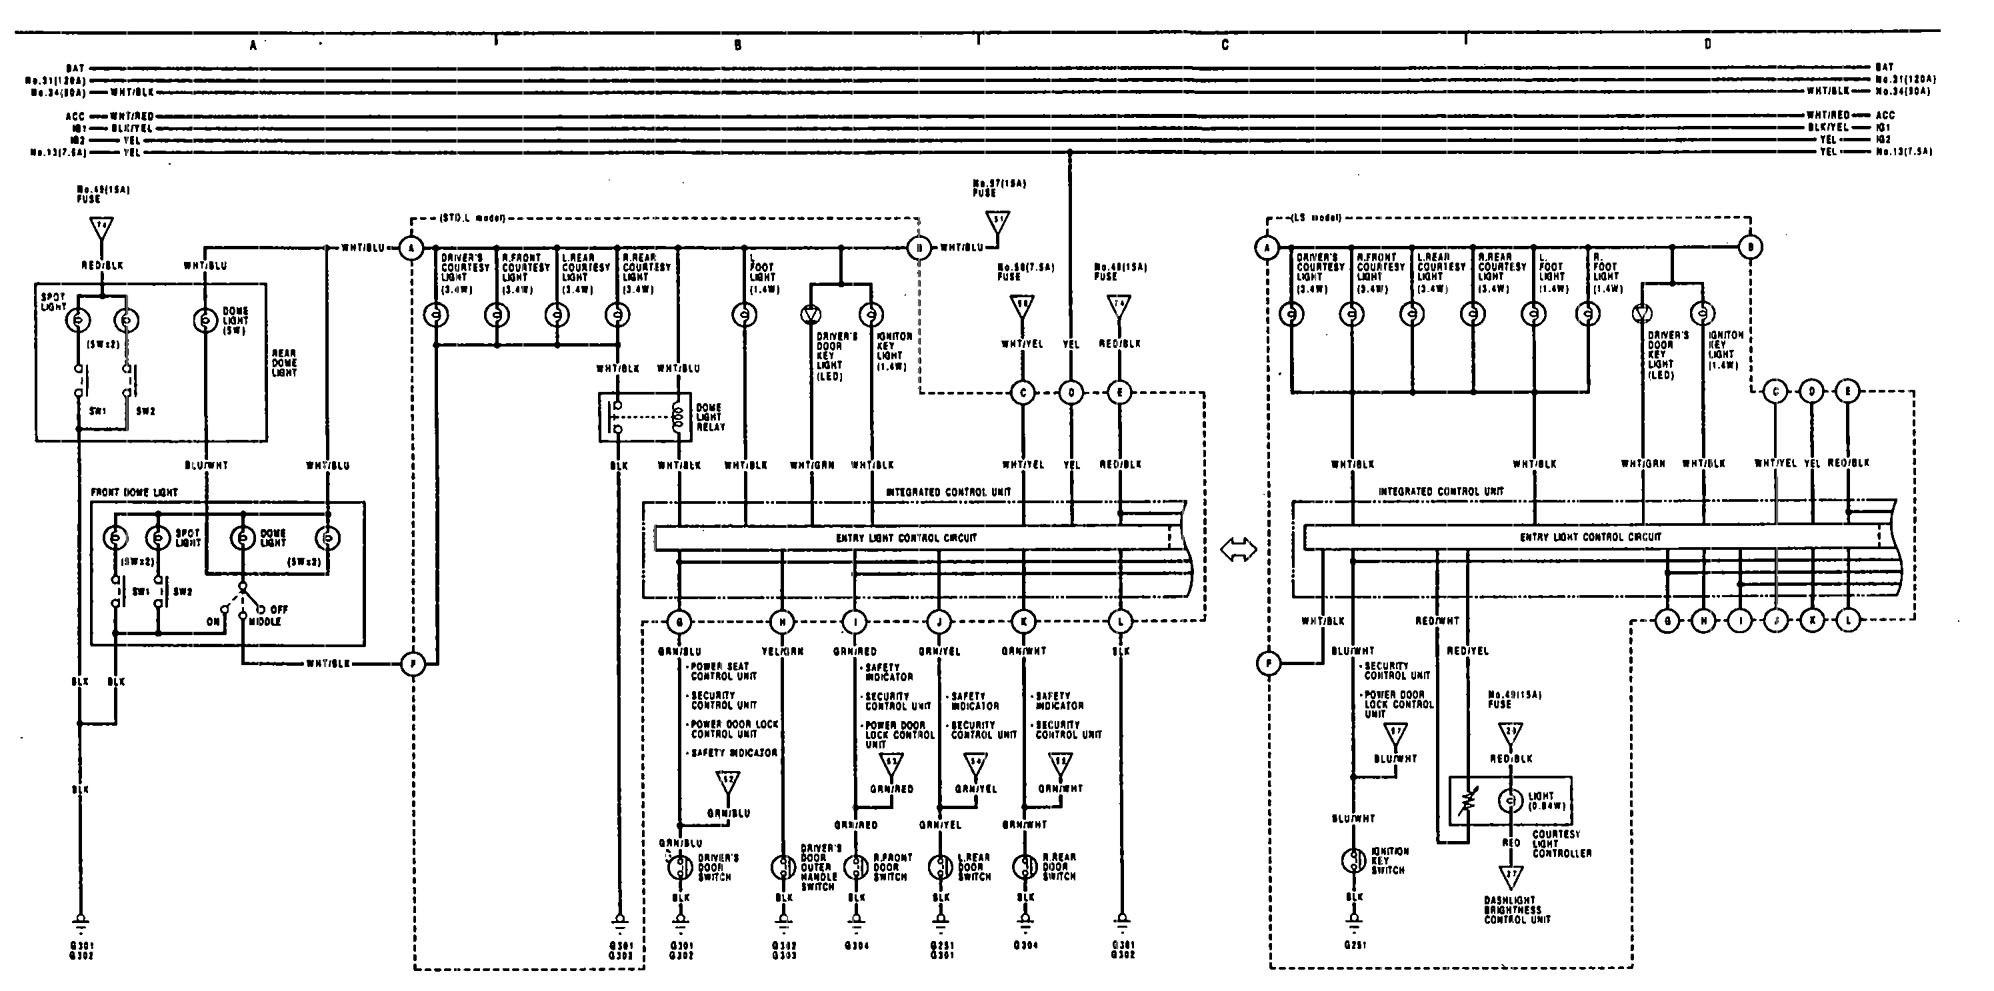 1992 Acura Legend Wiring Diagram Great Design Of 1991 Mustang Electrical Illuminated Radio 1970